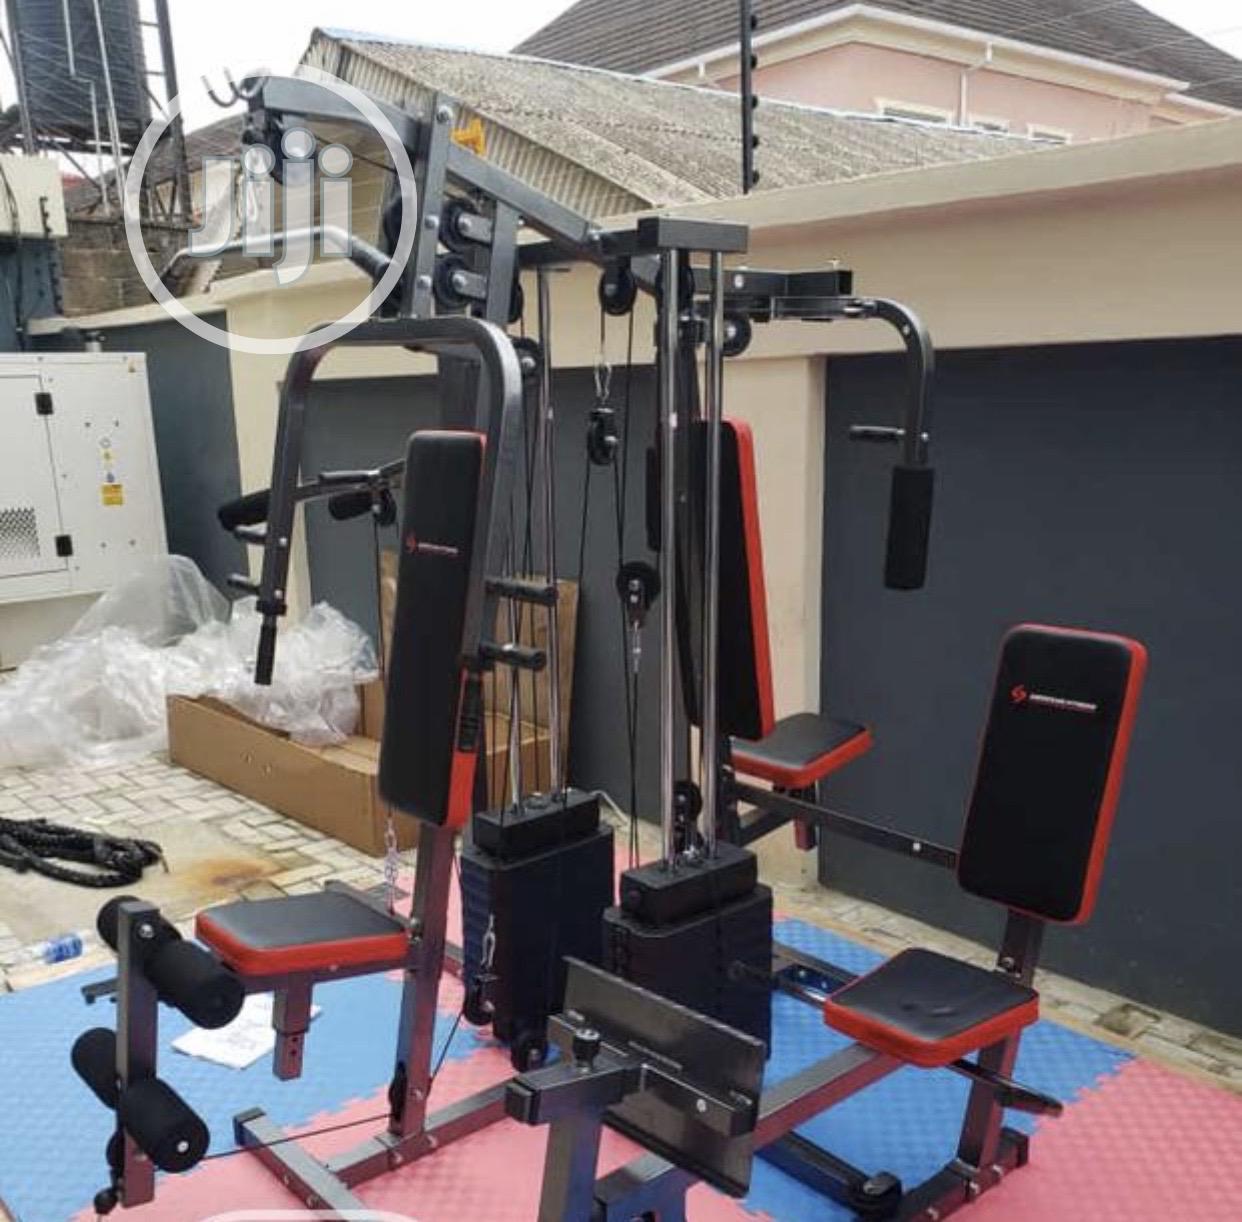 4 Station Gym Set